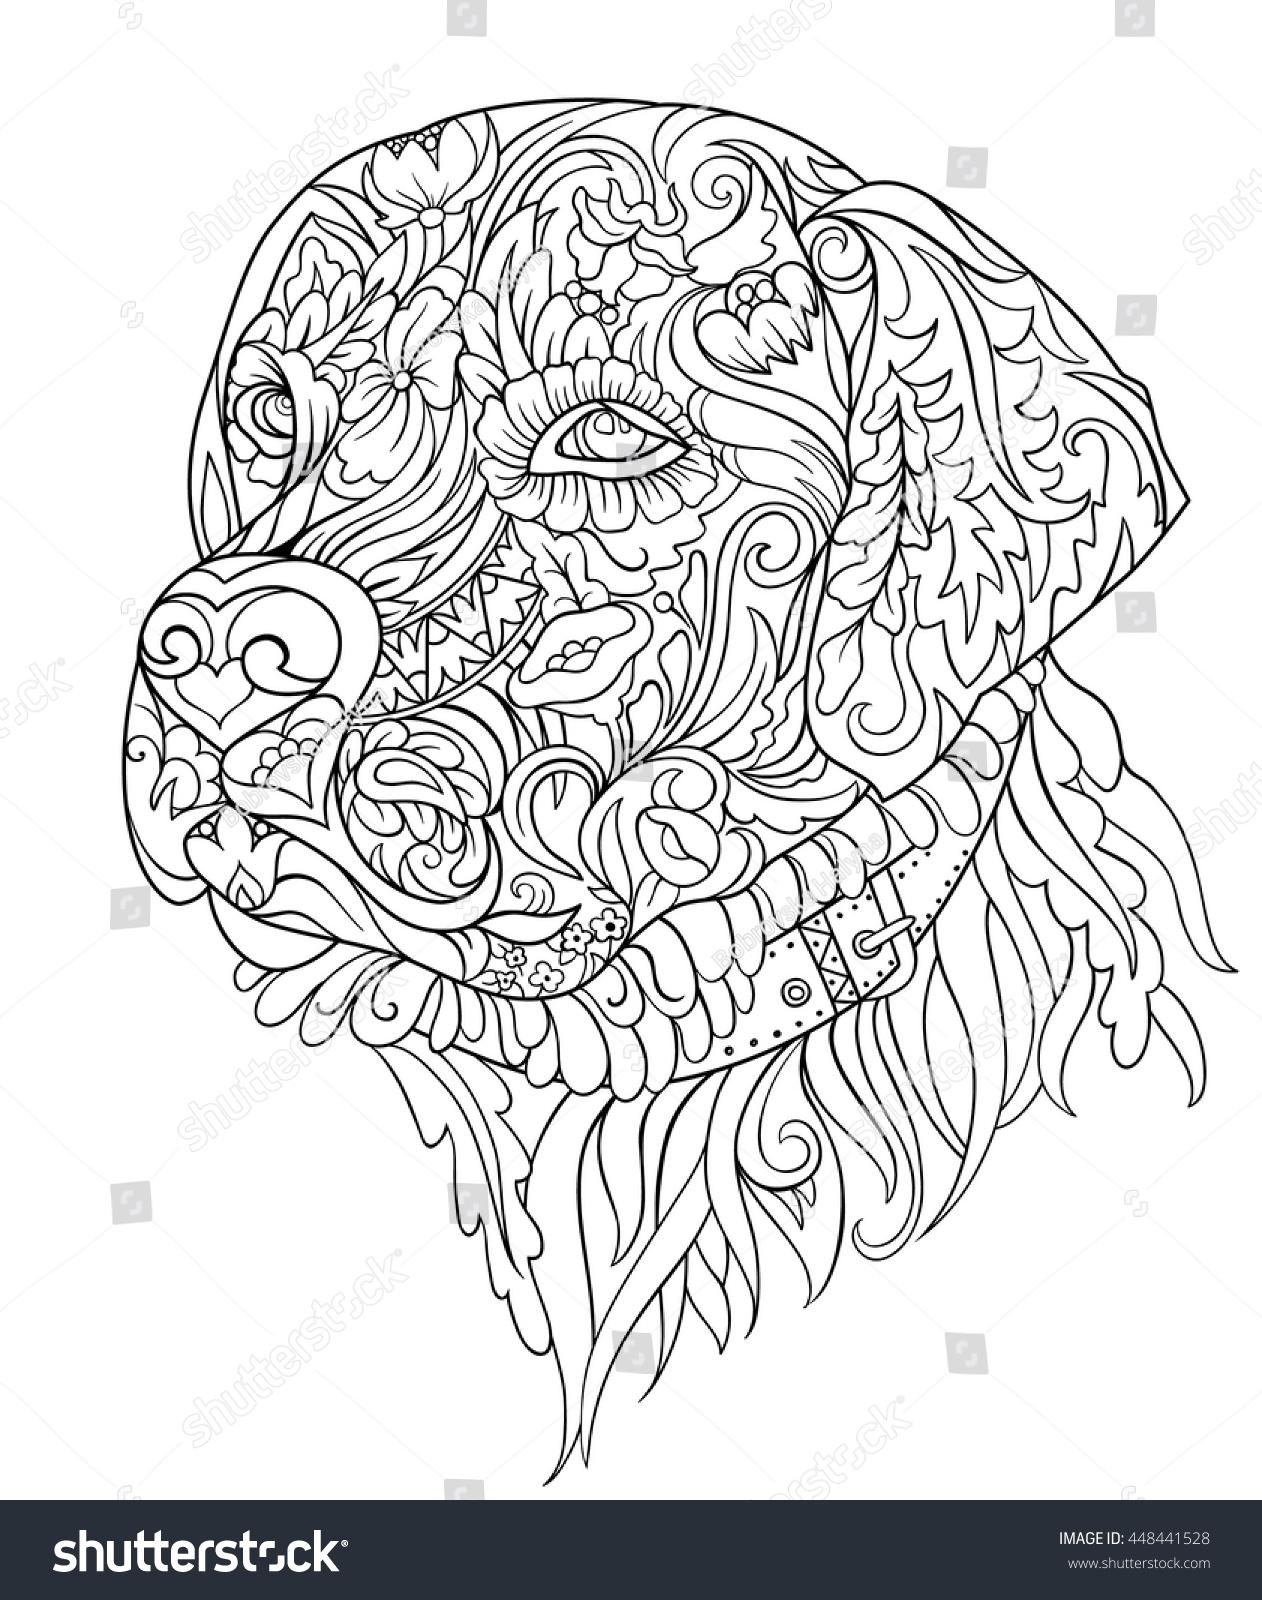 Zentangle Cute Dog Hand Drawn Sketch Stock Vector ...